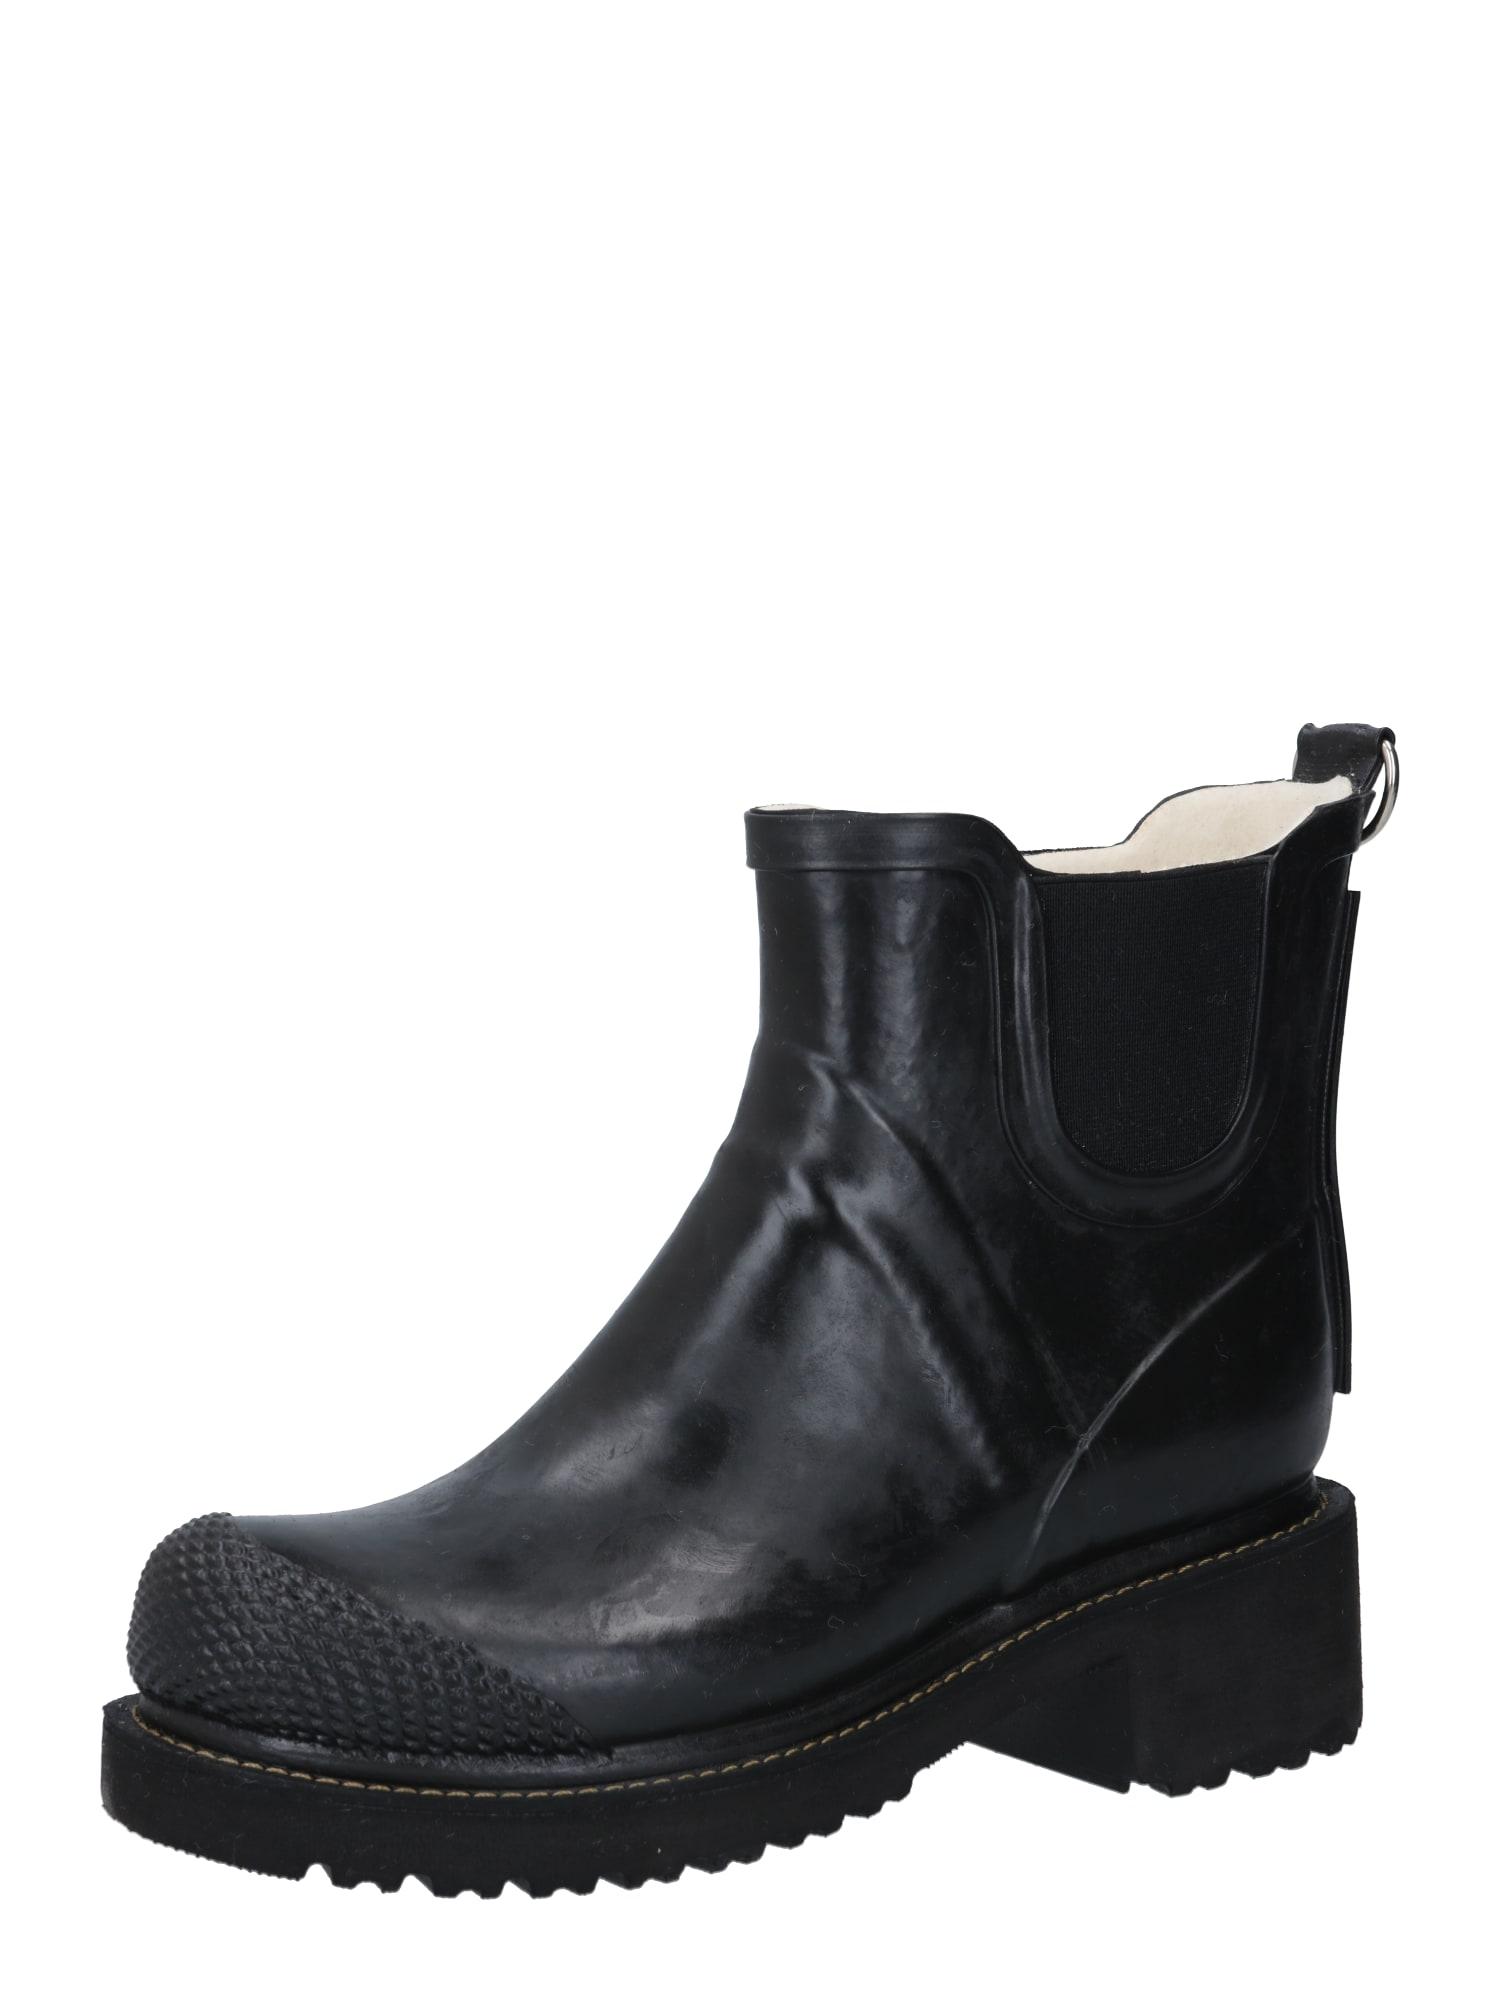 ILSE JACOBSEN Guminiai batai juoda